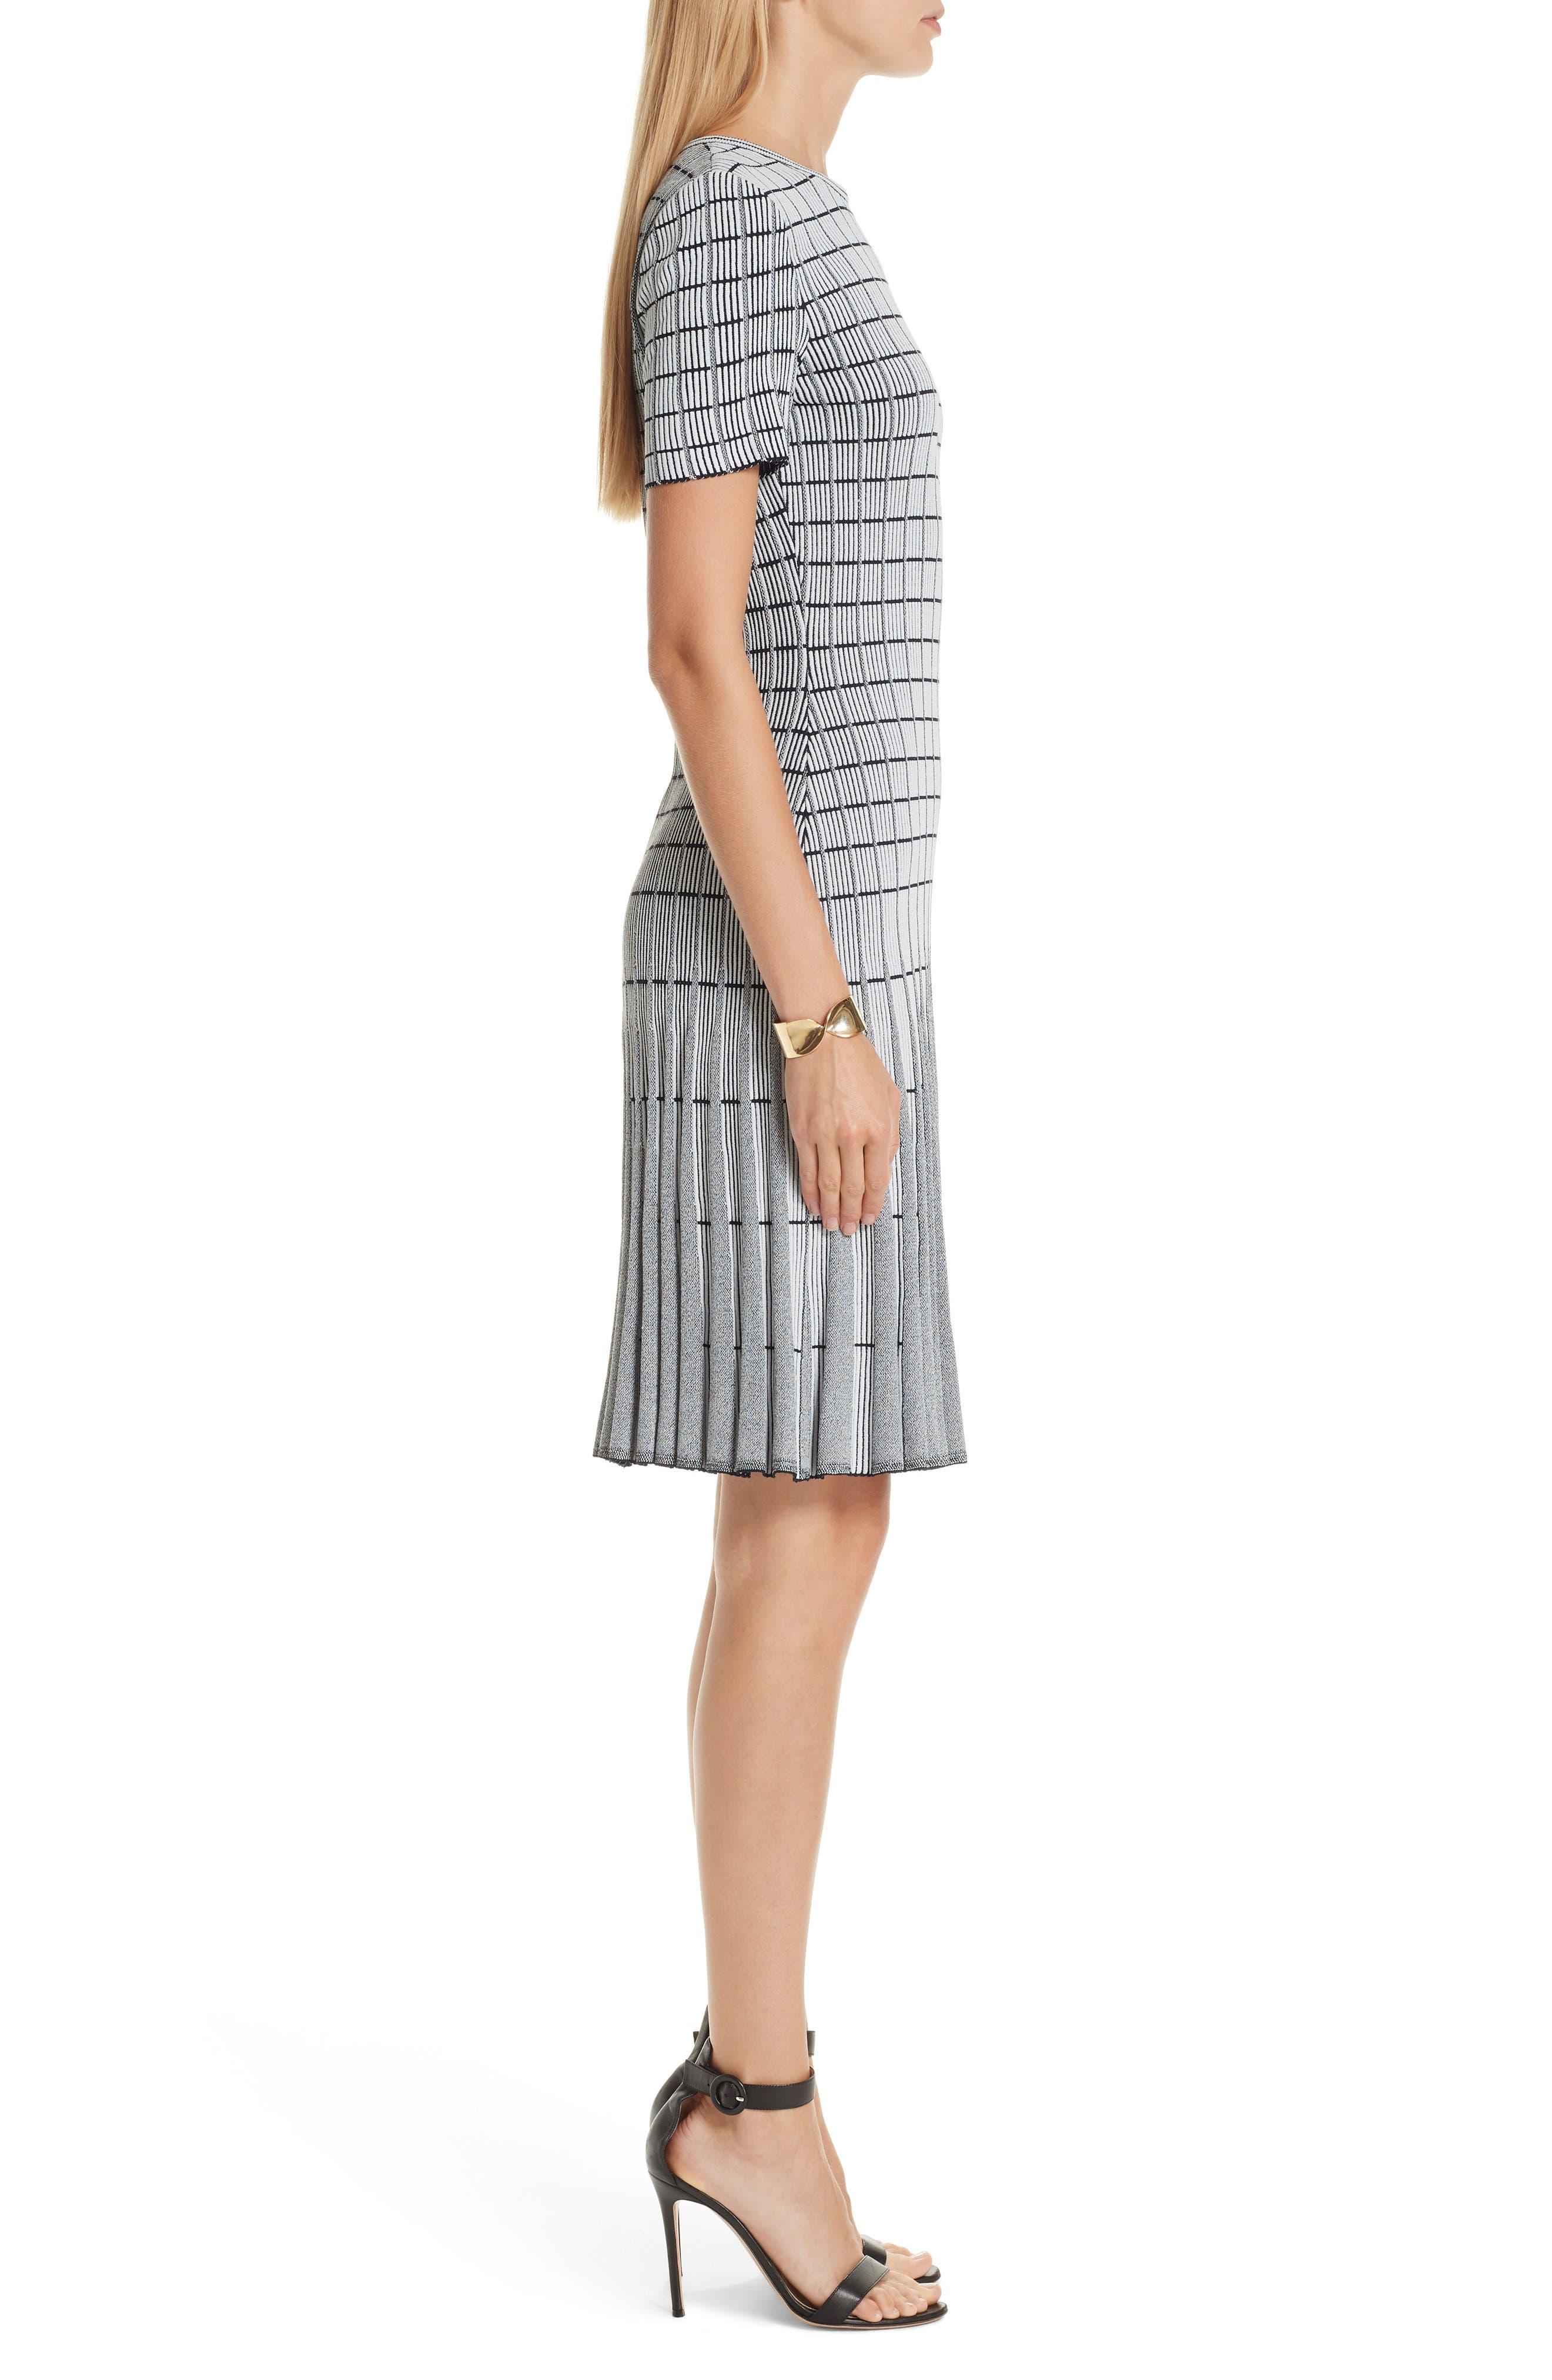 ST. JOHN COLLECTION, Monochrome Ottoman Knit Dress, Alternate thumbnail 5, color, GREY/ NAVY